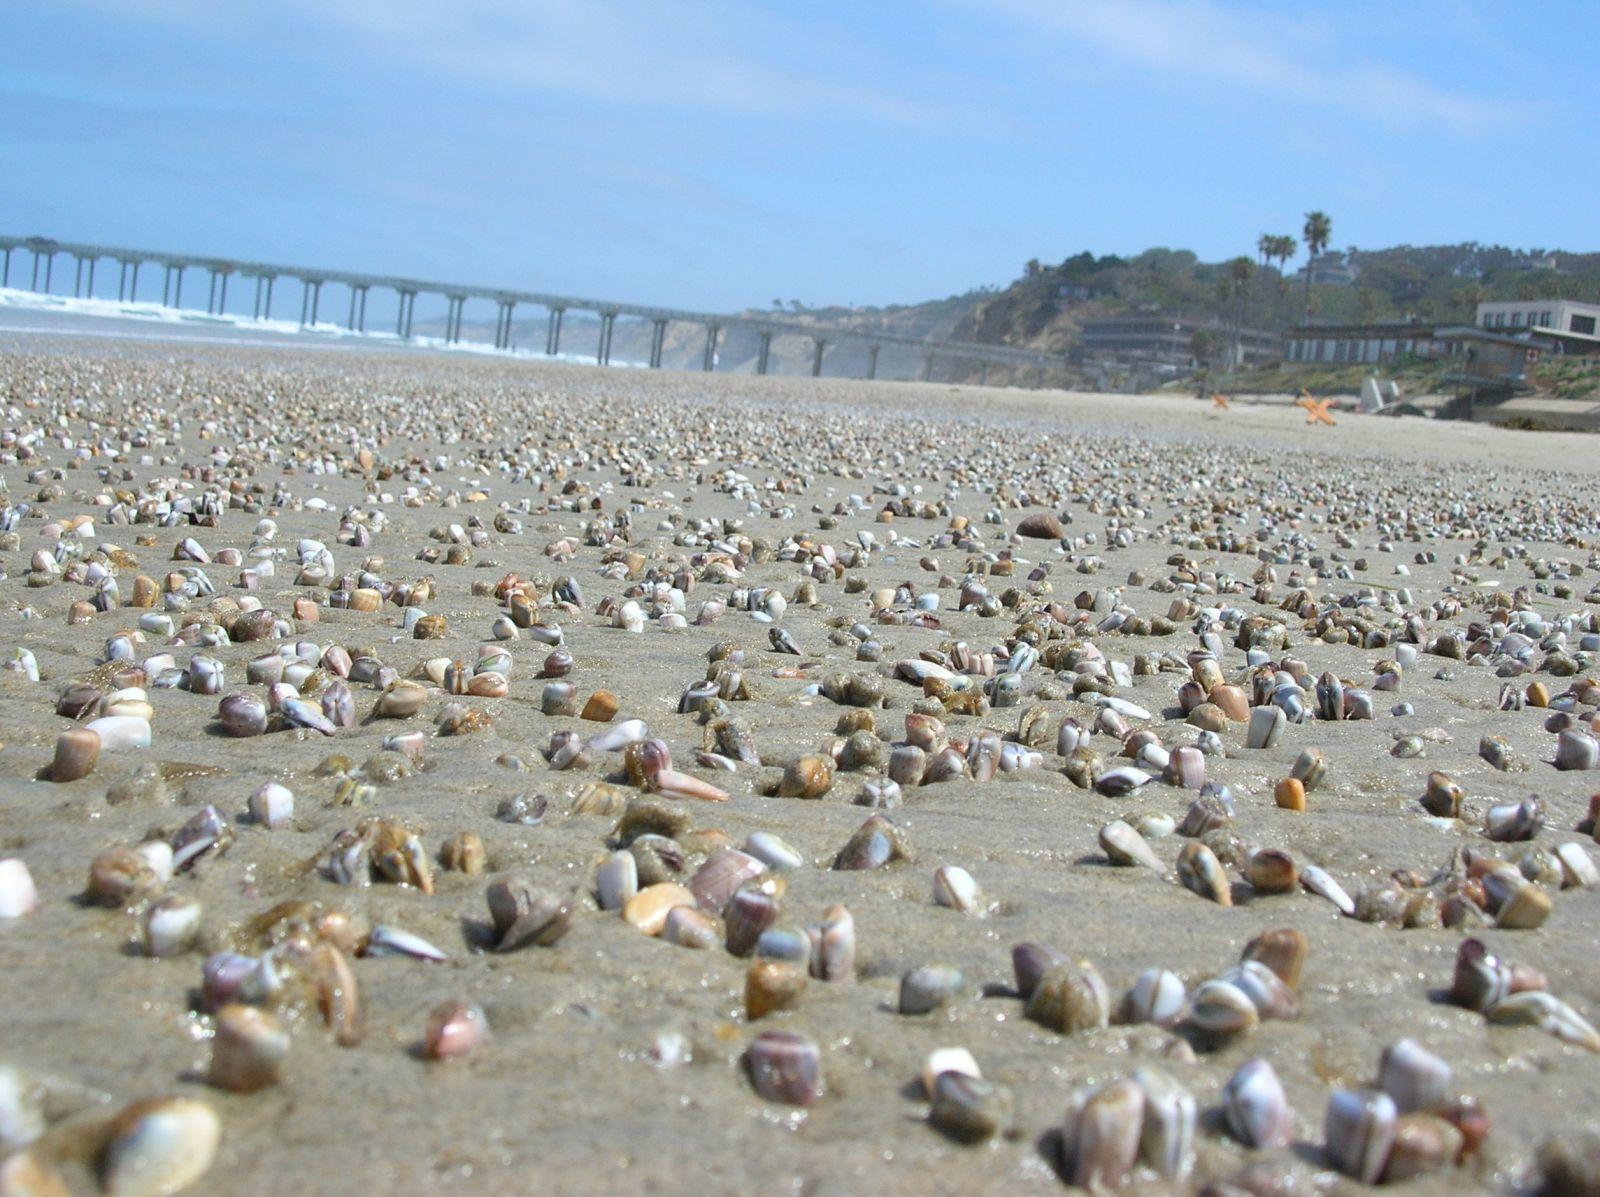 Clams in La Jolla. Credit: Dave Hubbard